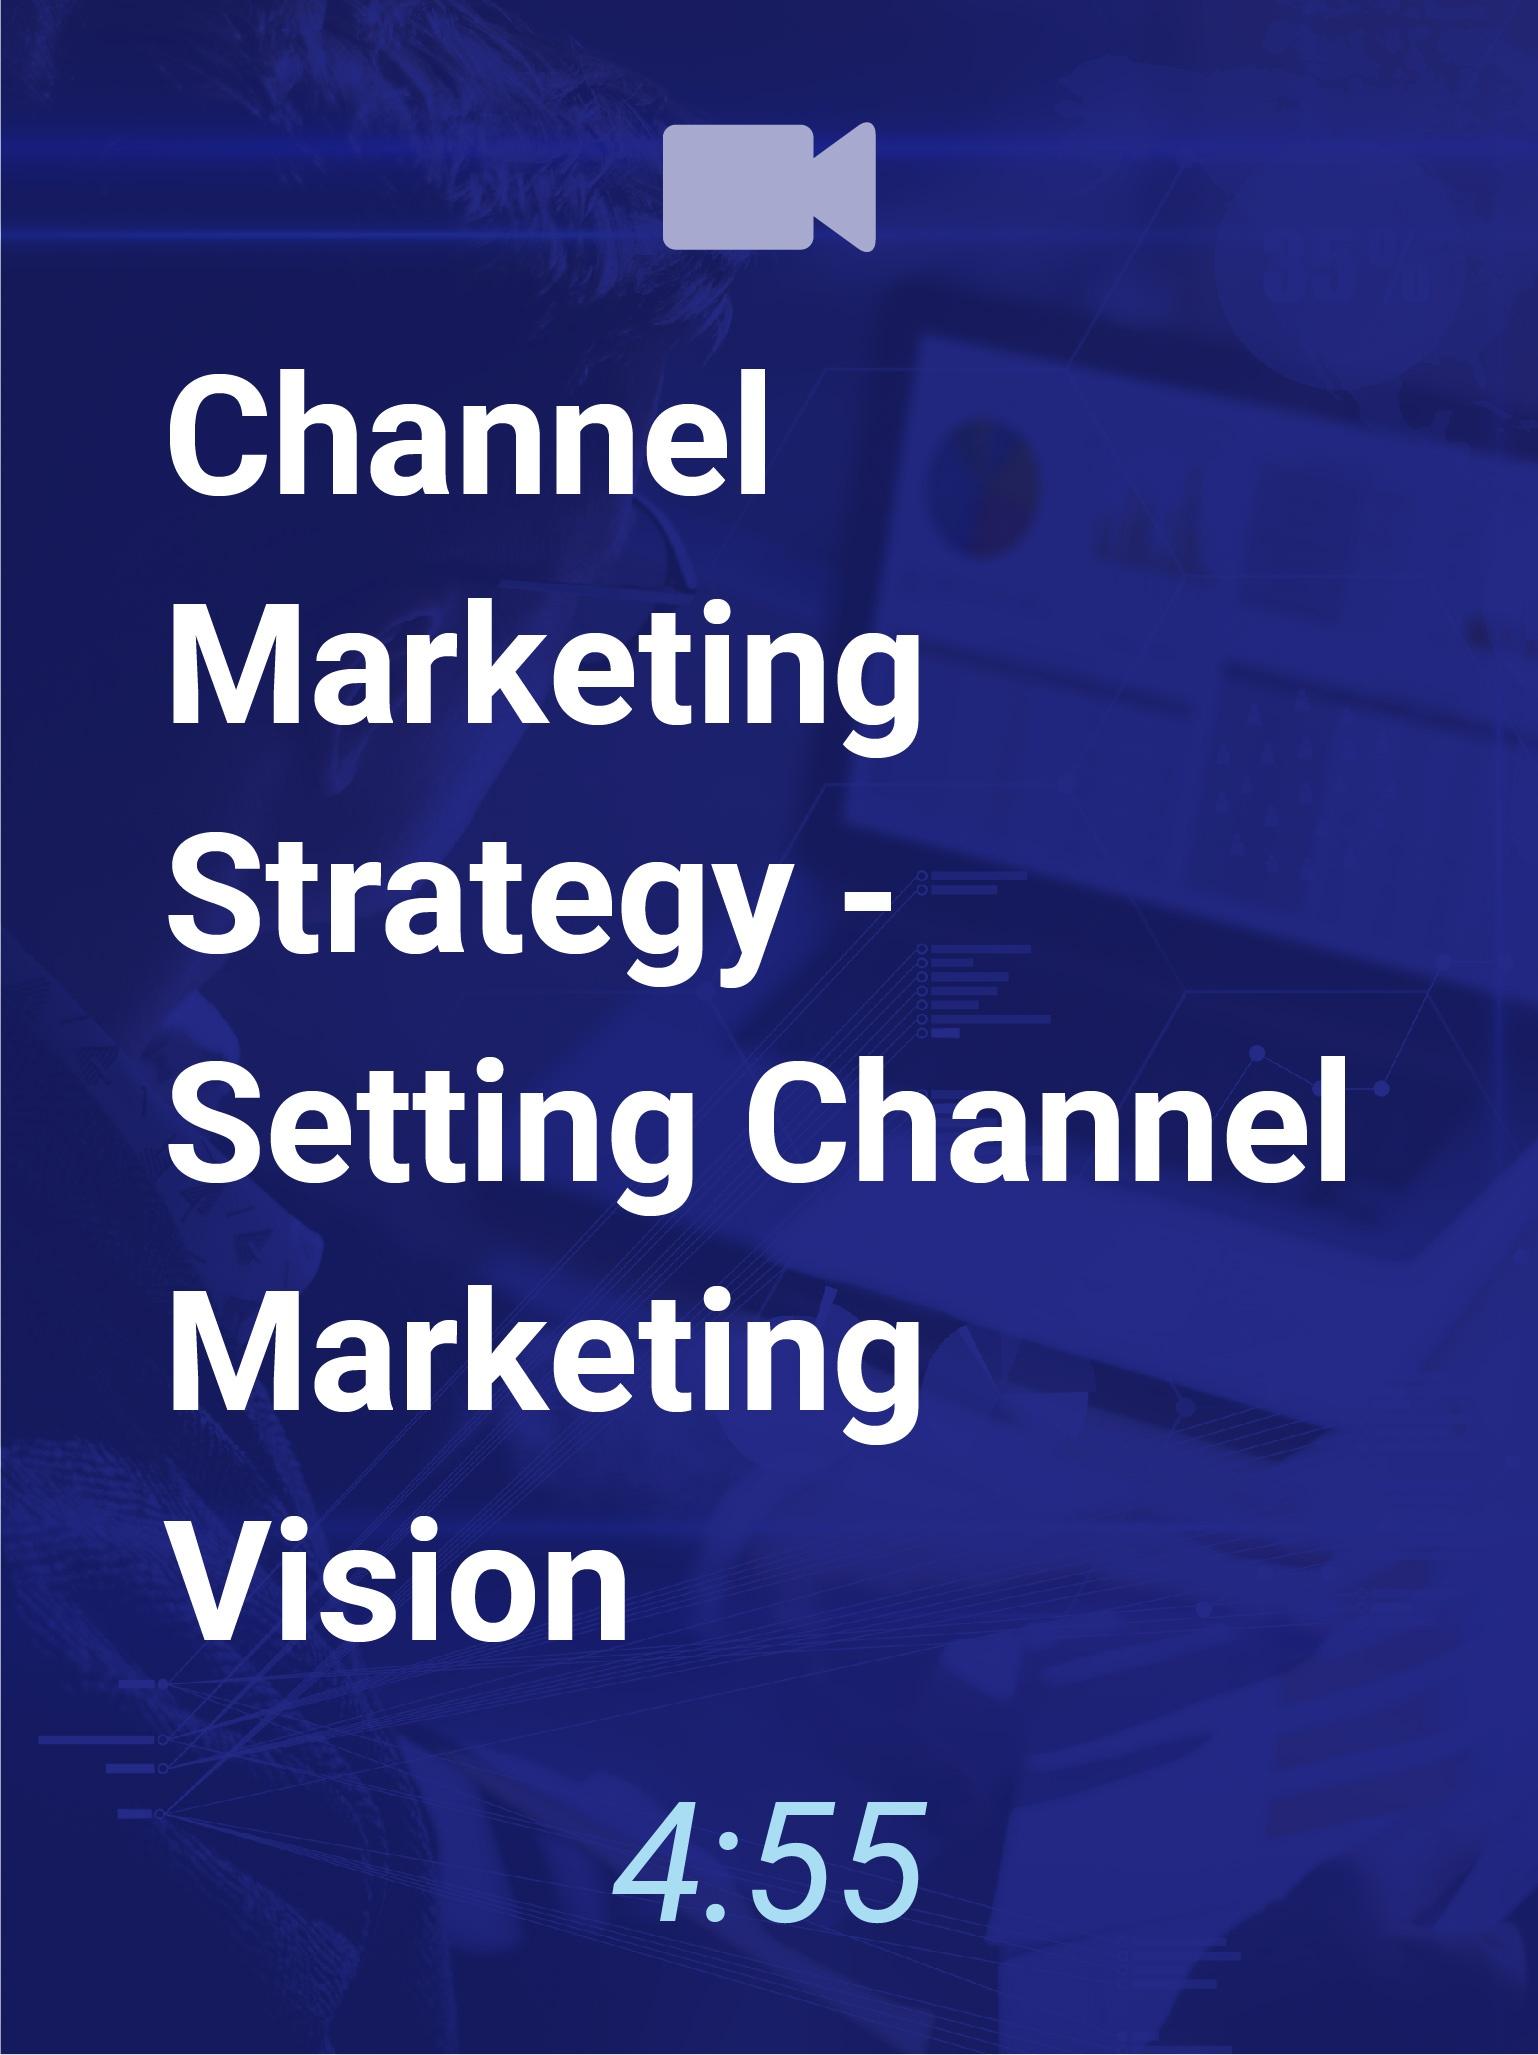 channel marketing strategy